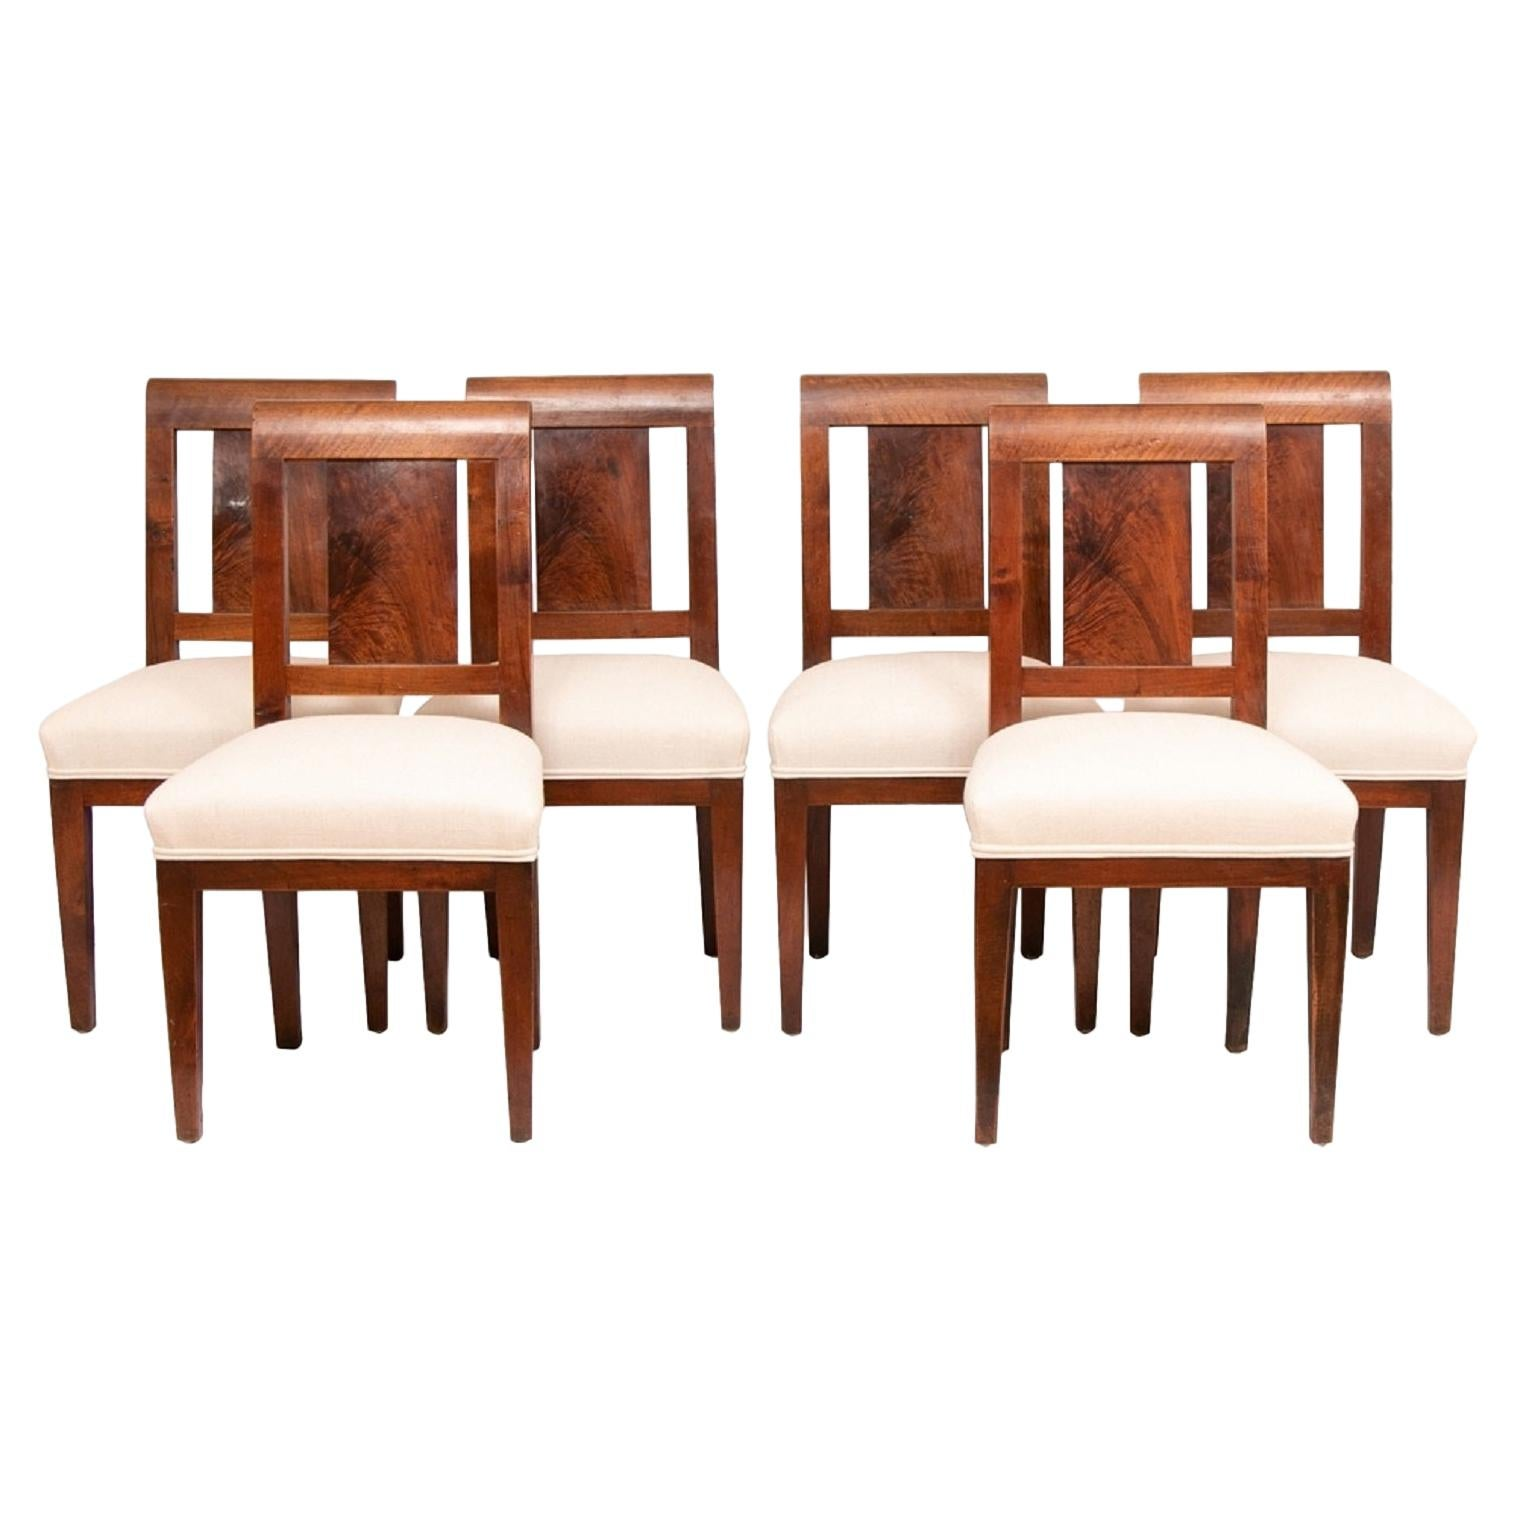 Set of 6 Walnut Dining Chairs, 20th Century